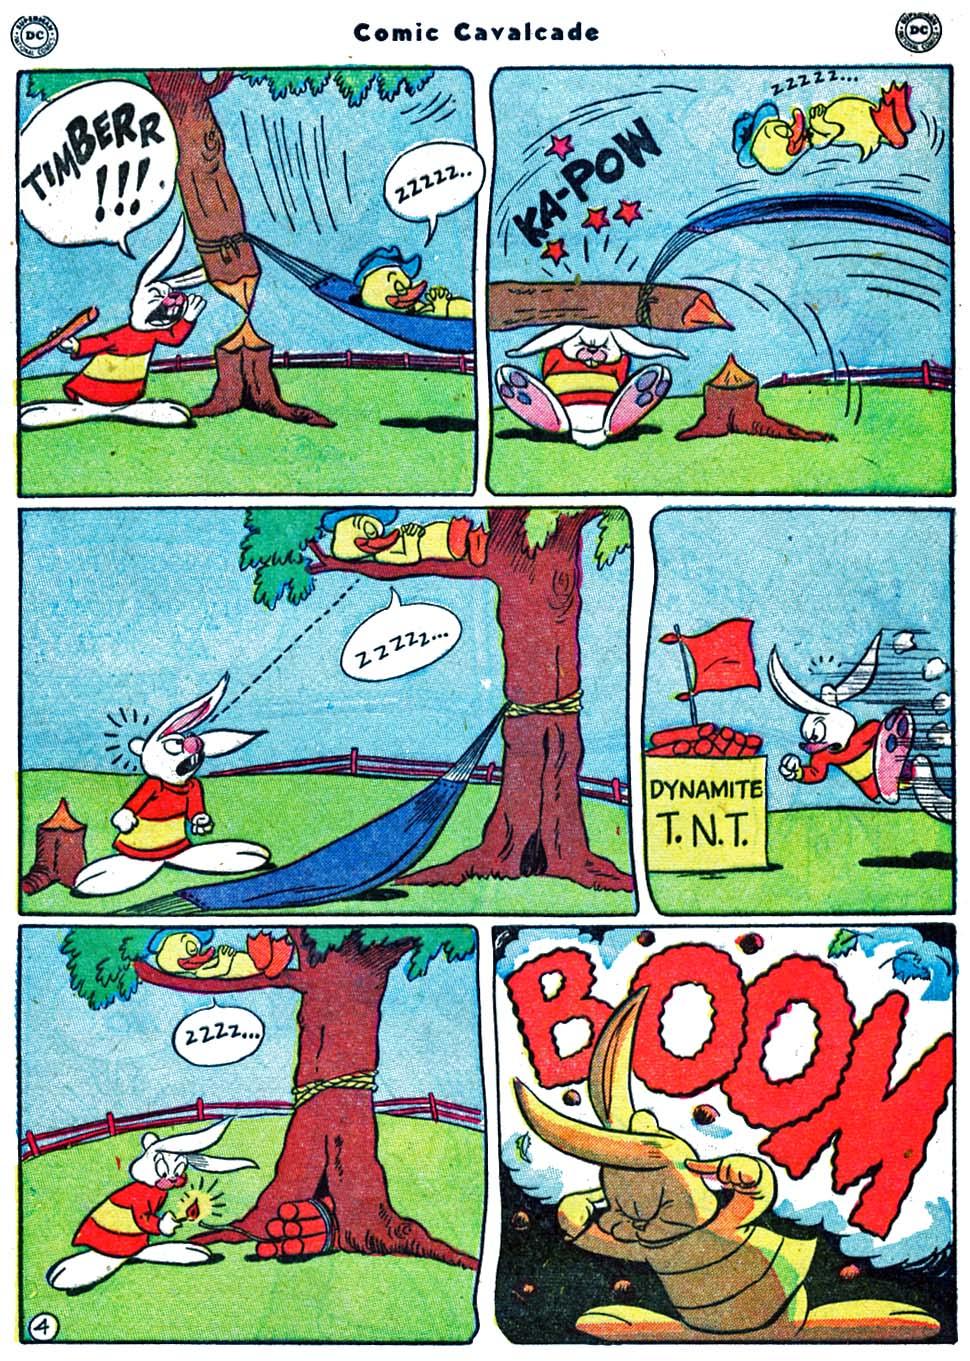 Comic Cavalcade issue 40 - Page 41